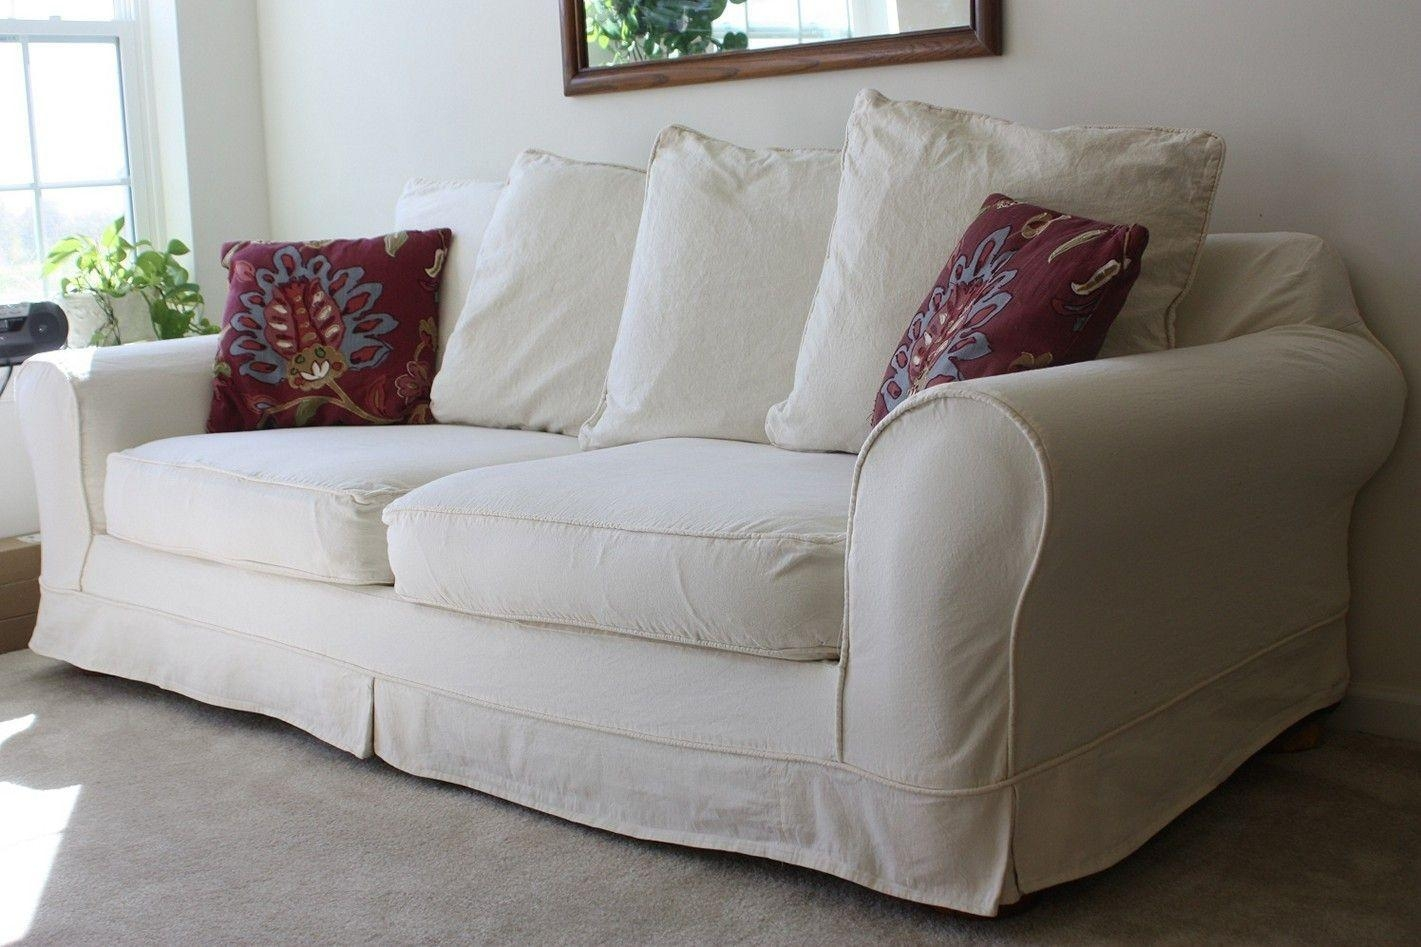 Furniture Home: Slipcover Sofa Shabby Chic Sofa Slipcovers Sure Intended For Shabby Chic Sofa Slipcovers (View 7 of 20)